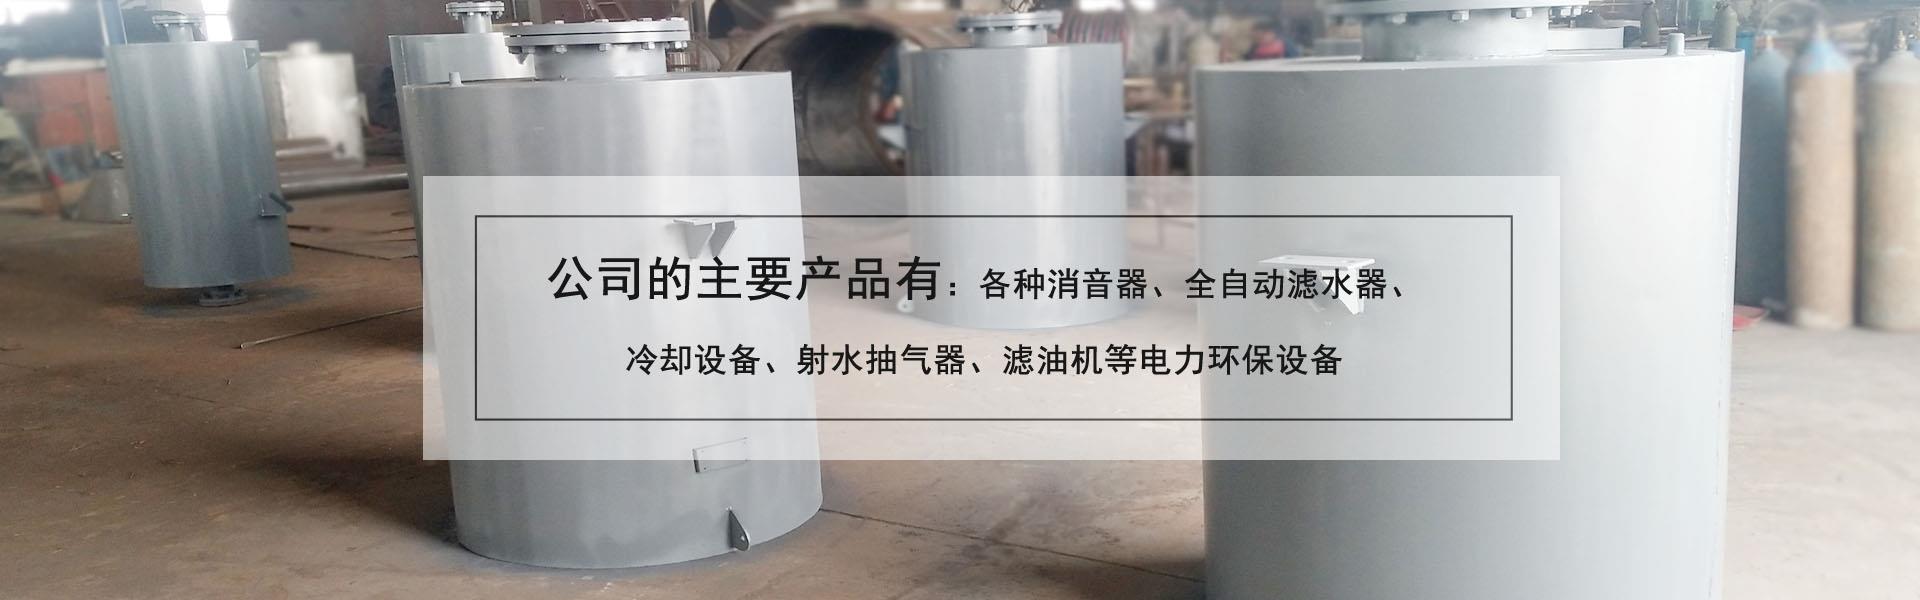 lian云港市澳门百老汇游xiji械she备有限公司